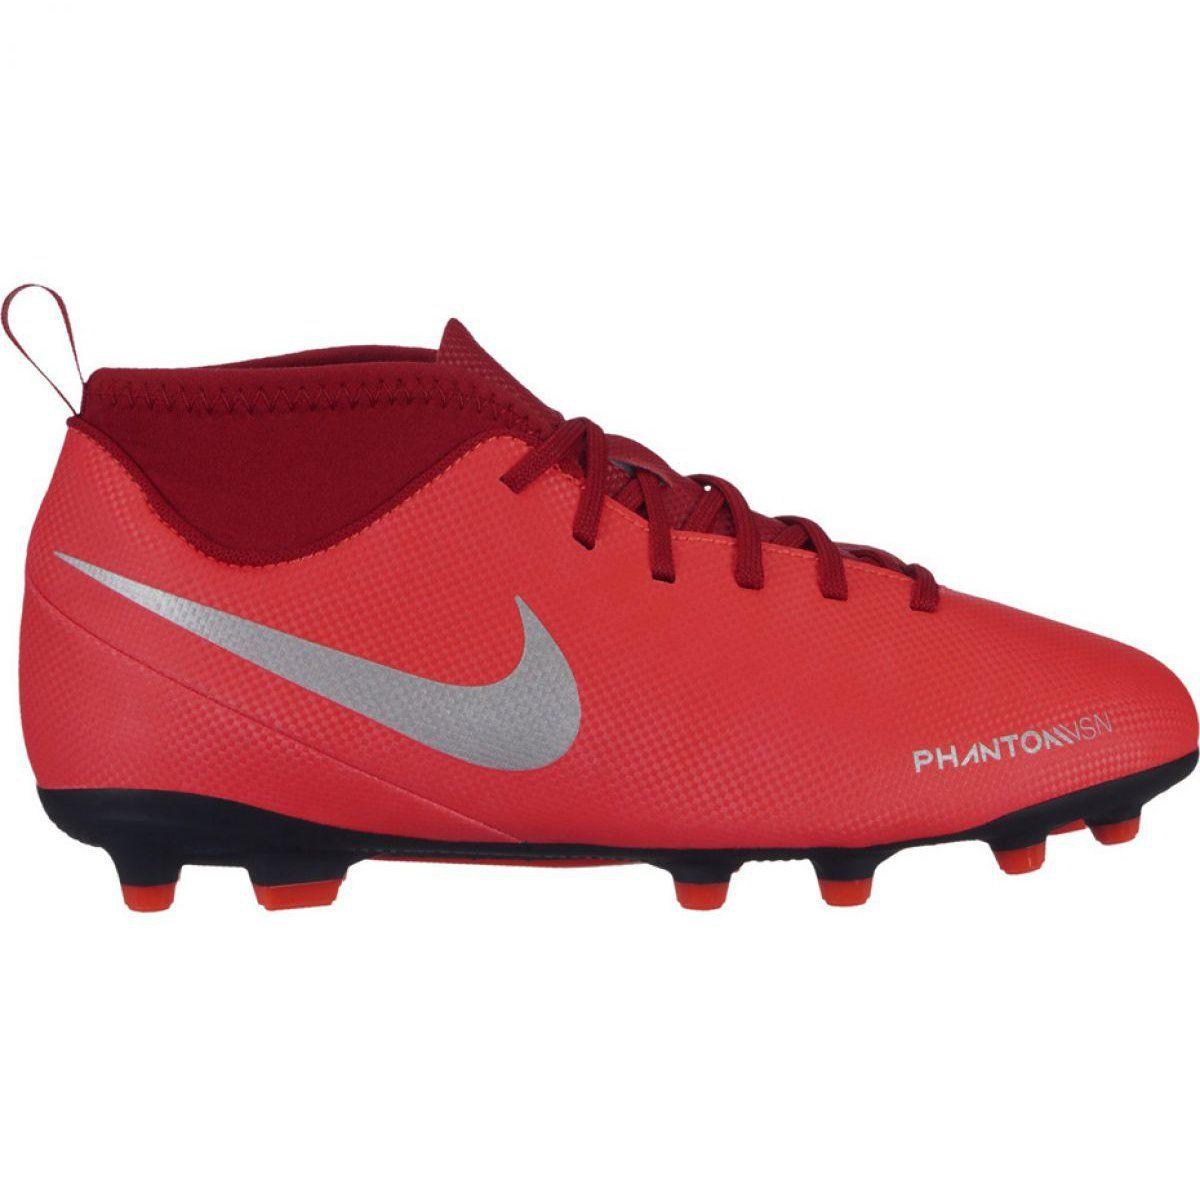 Nike Jr. Mercurial Vapor 13 Academy TF LittleBig Kids' Artificial Turf Soccer Shoe